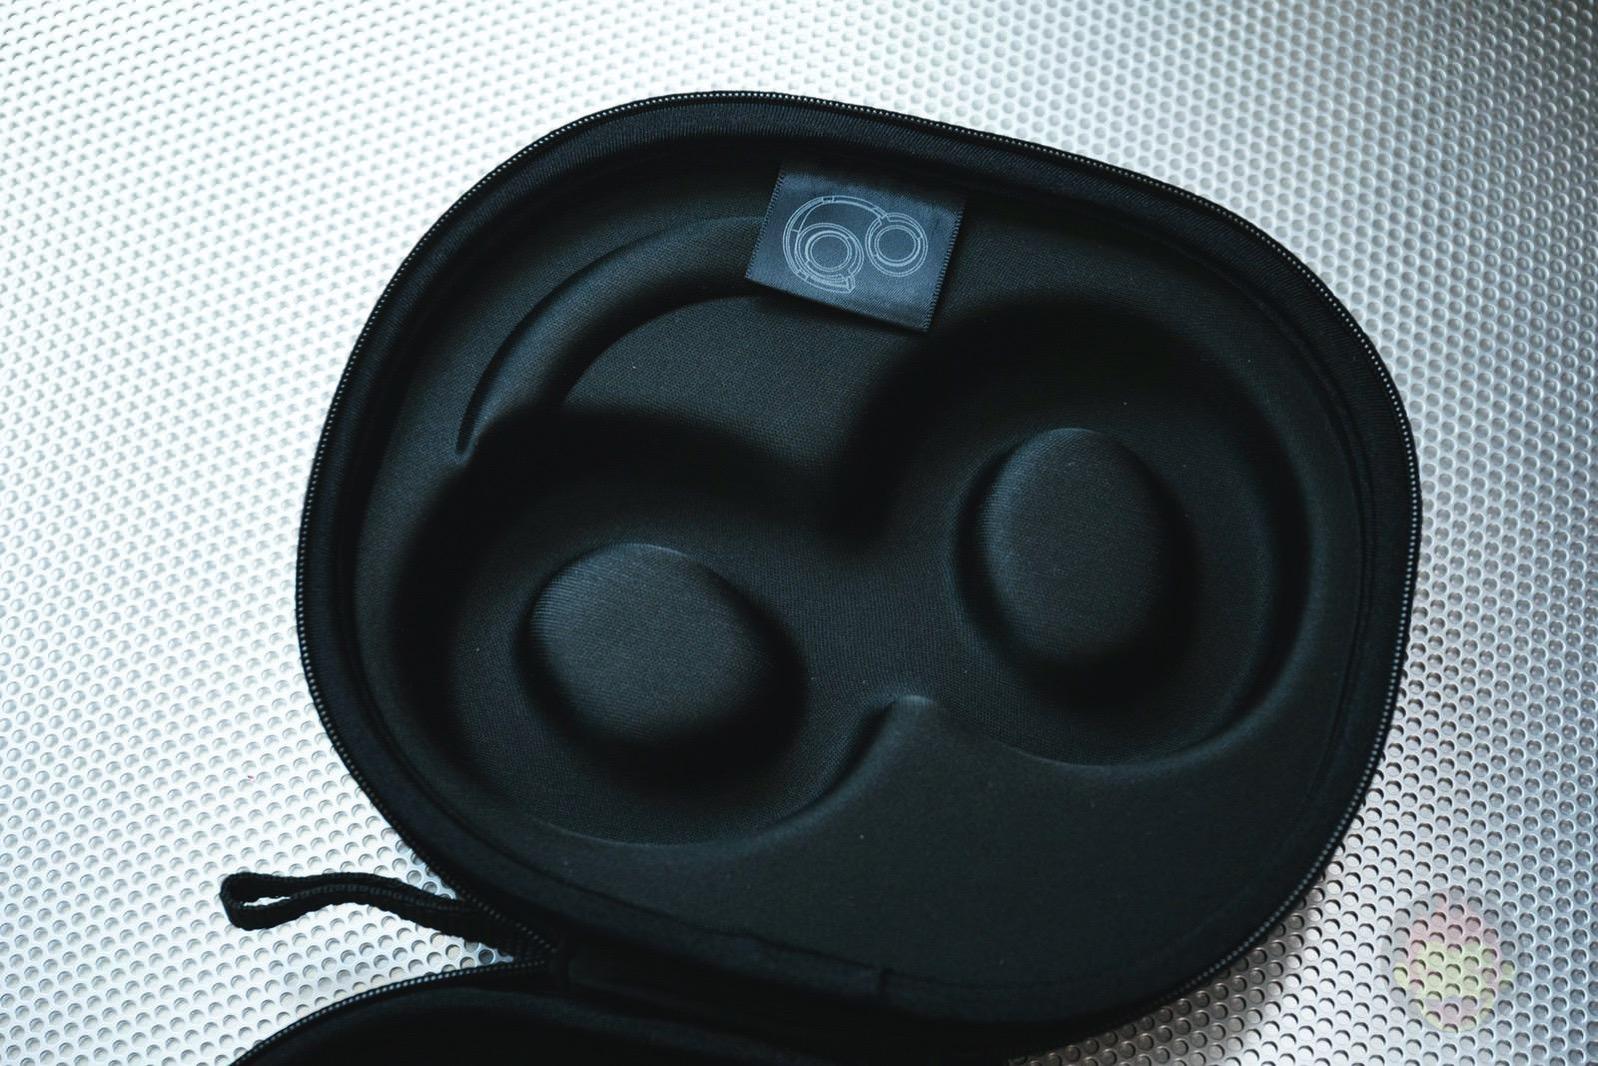 Soundcore-Space-NC-Wireless-Headphones-01.jpg